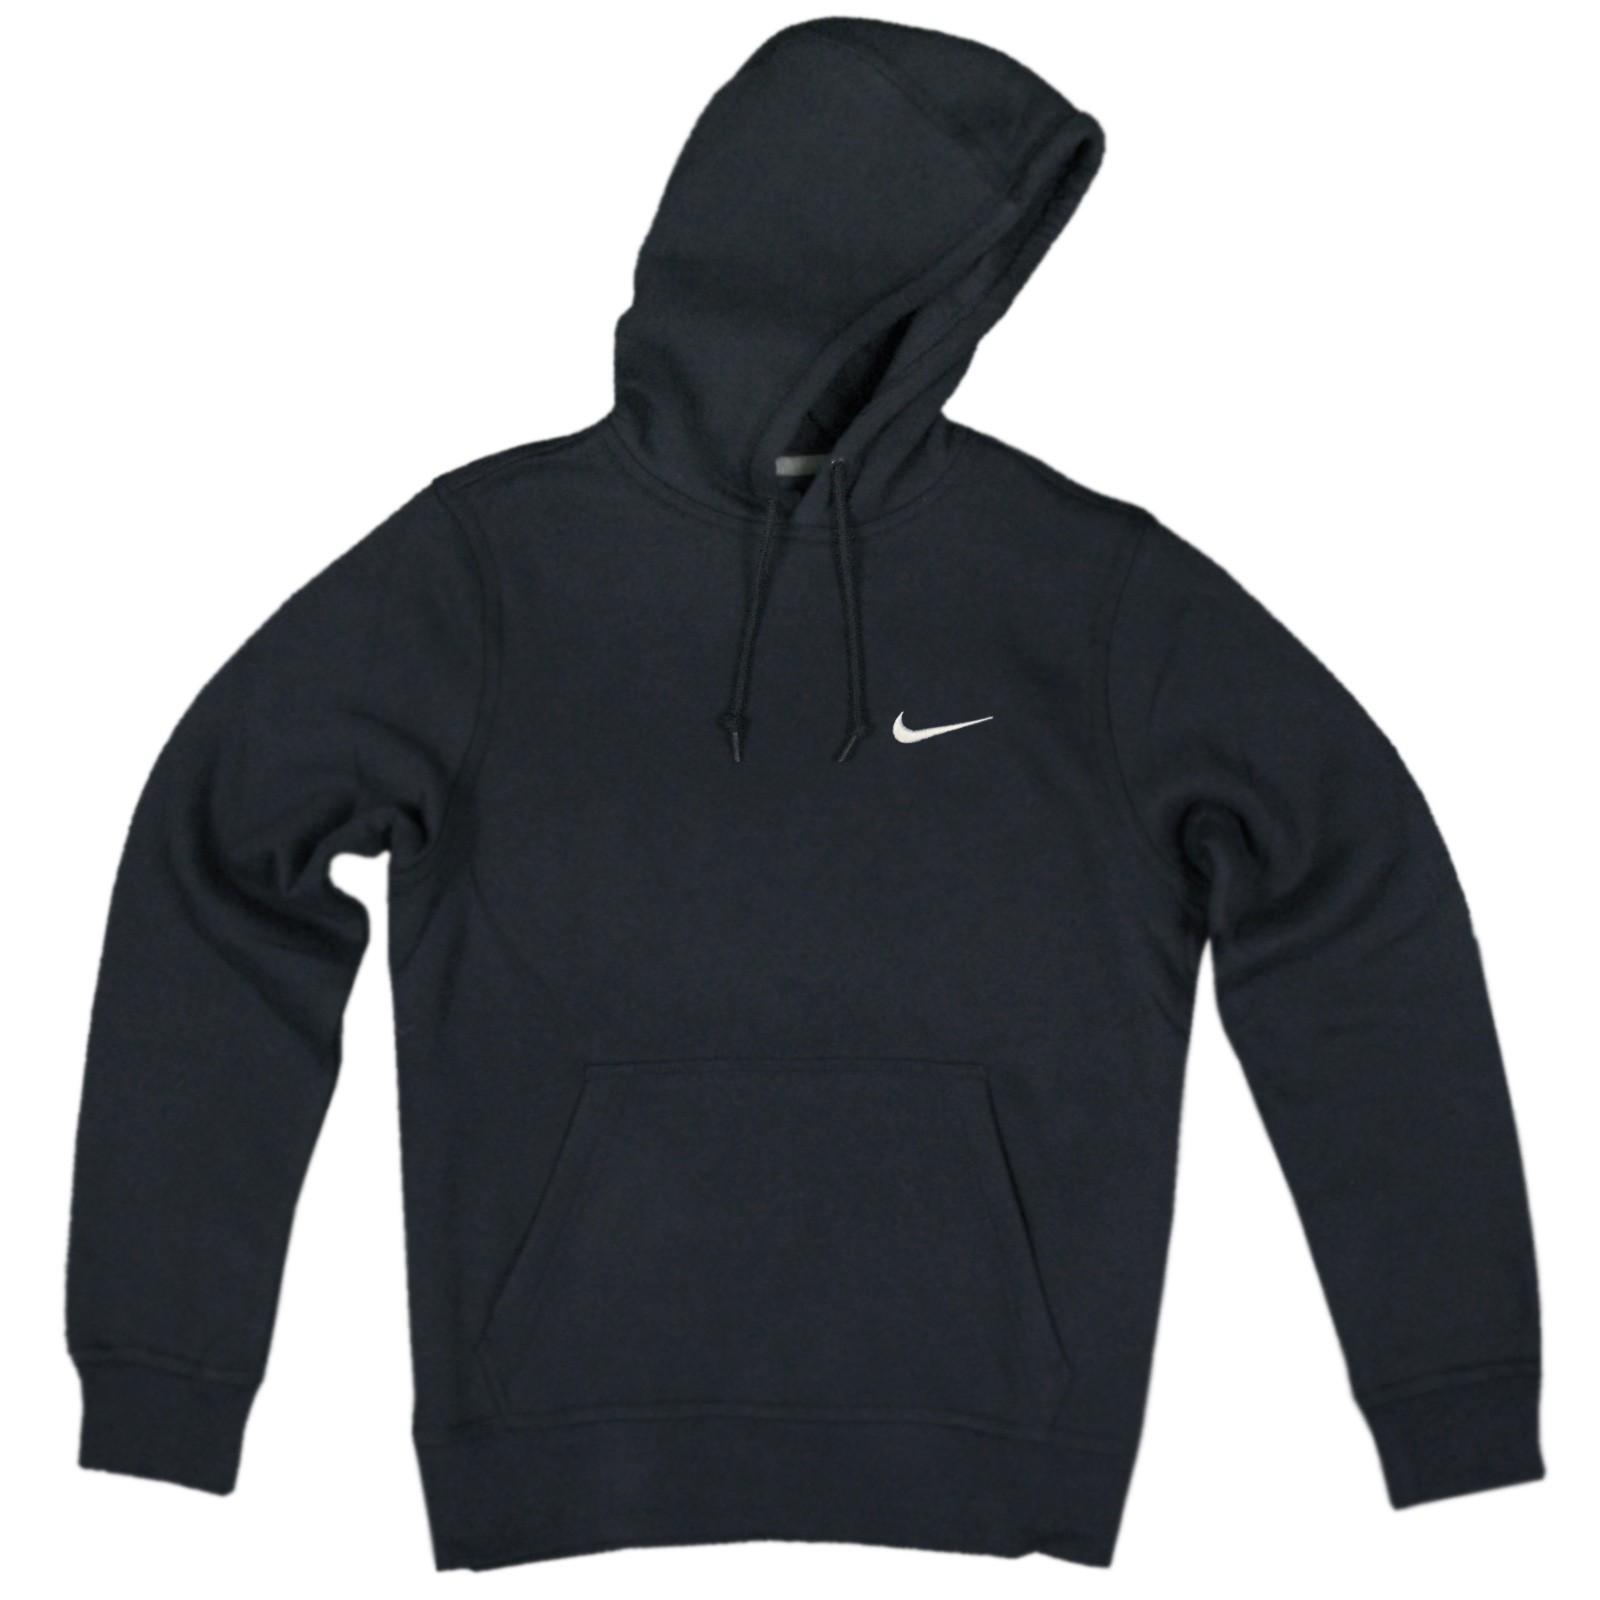 Nike hoodie shirt